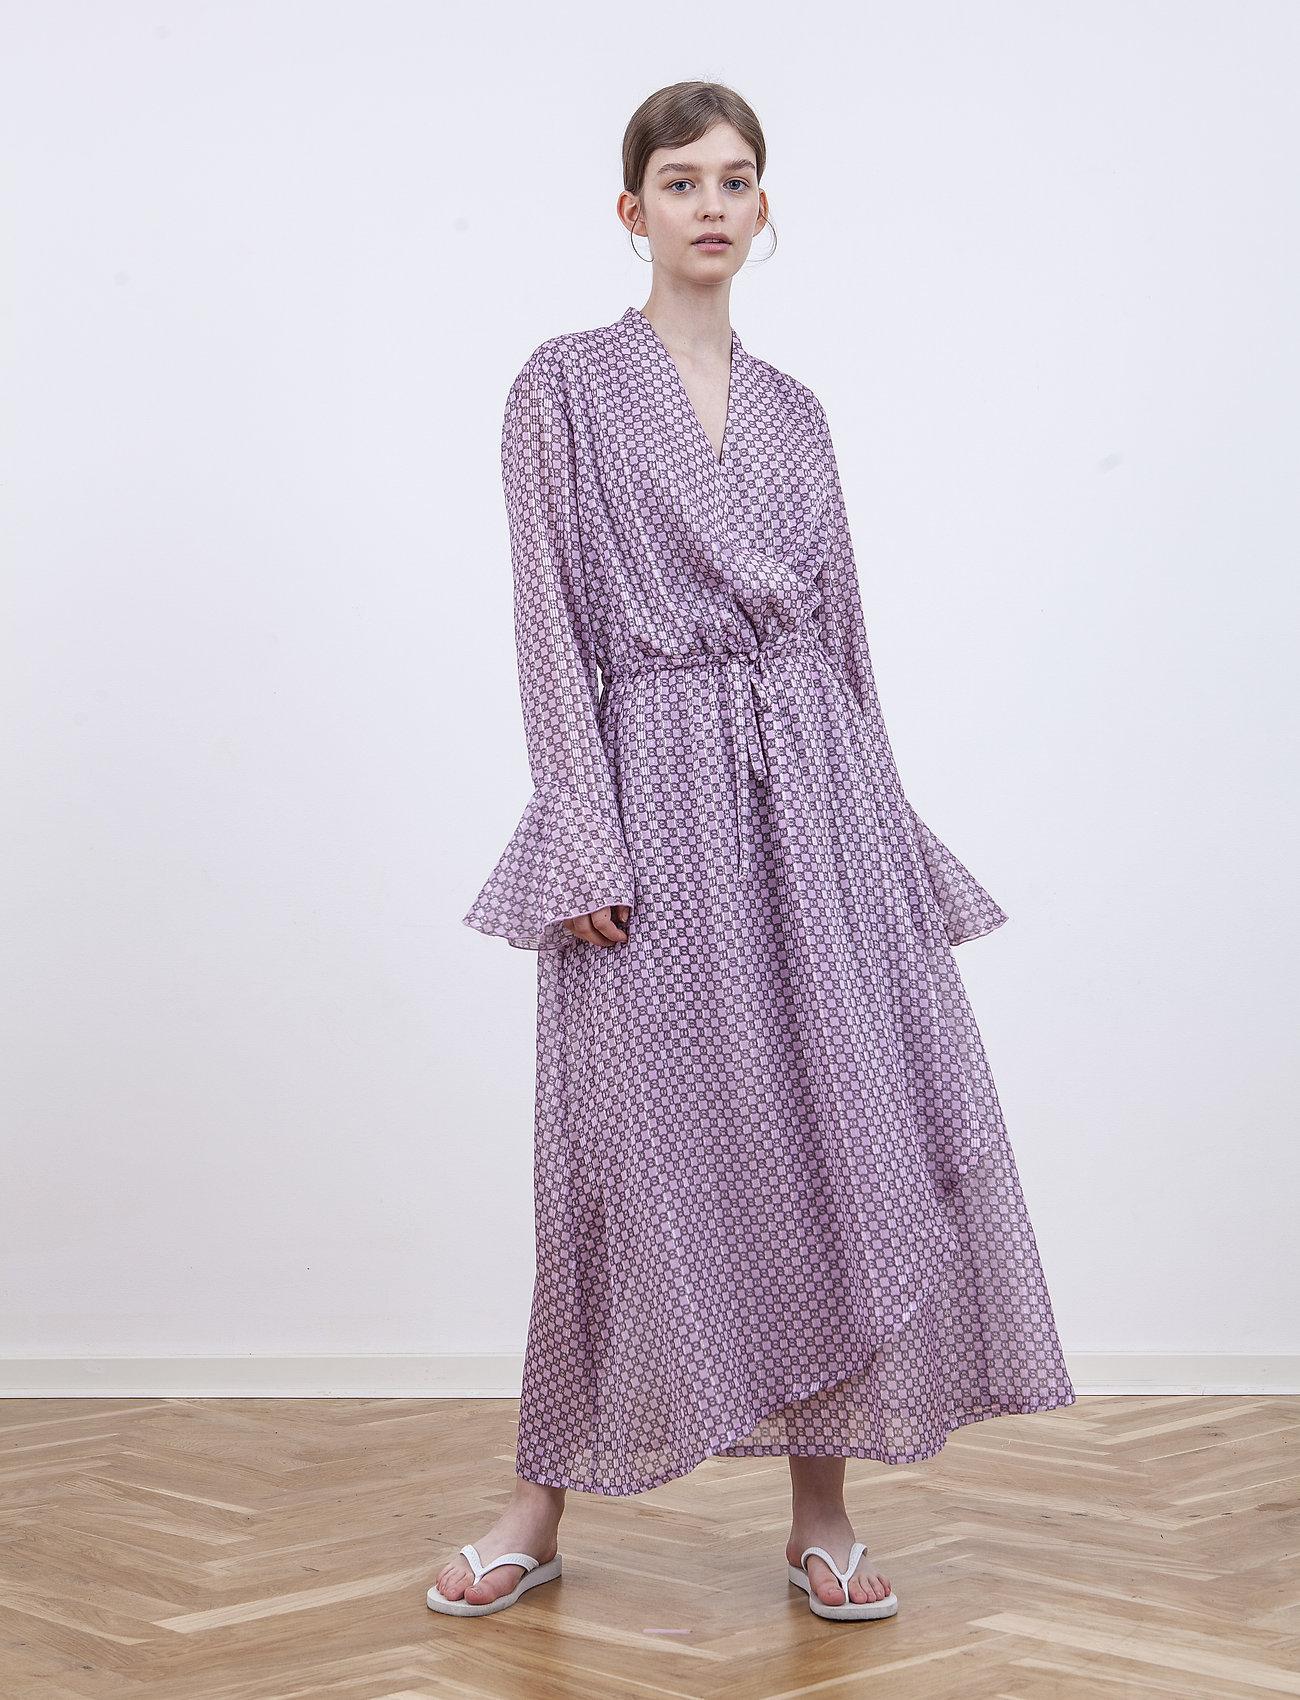 Birgitte Herskind - Rillo Dress - omlottklänning - aop pink chain